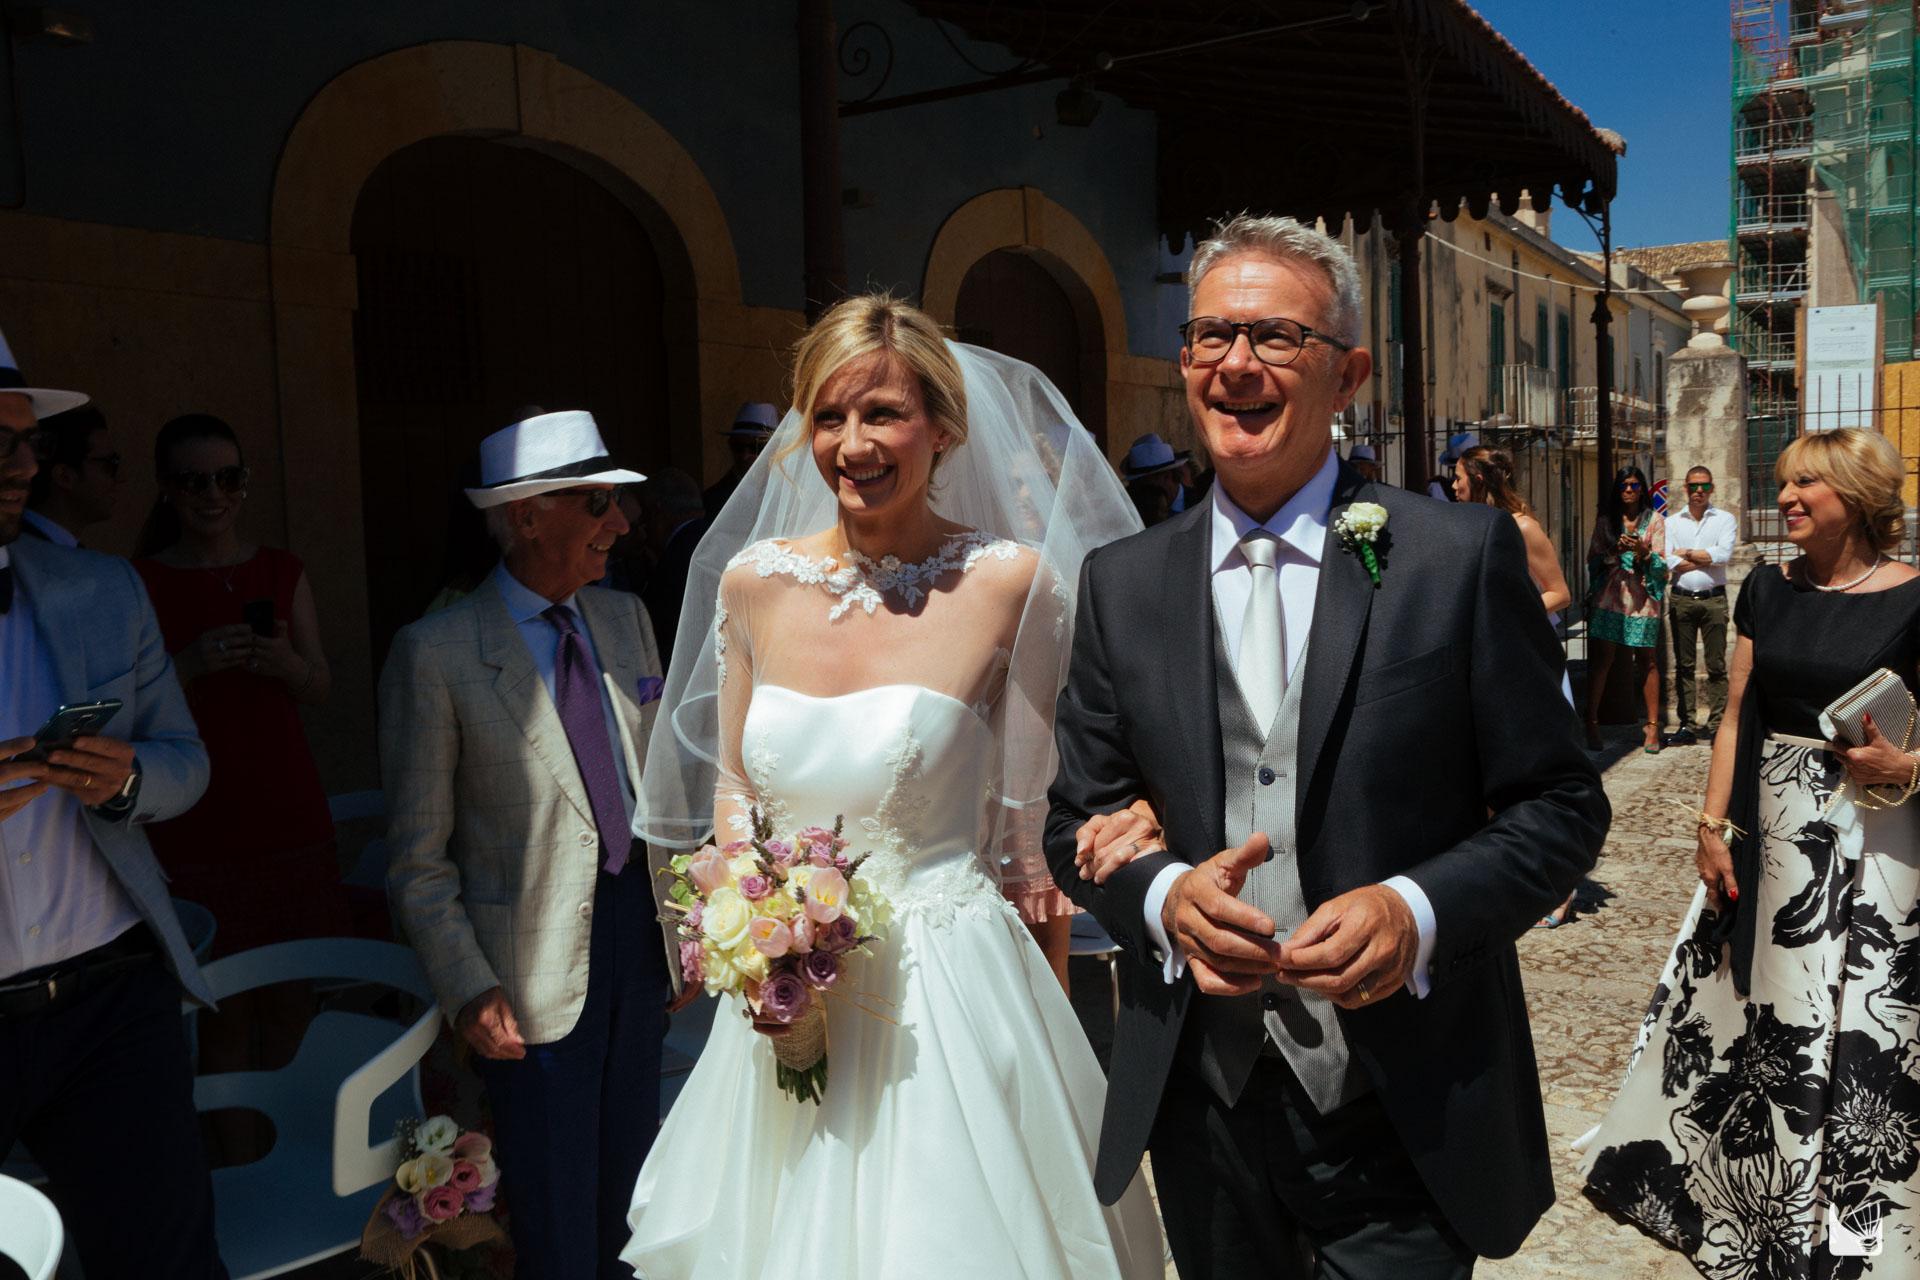 wedding_in_marzamemi-19.jpg